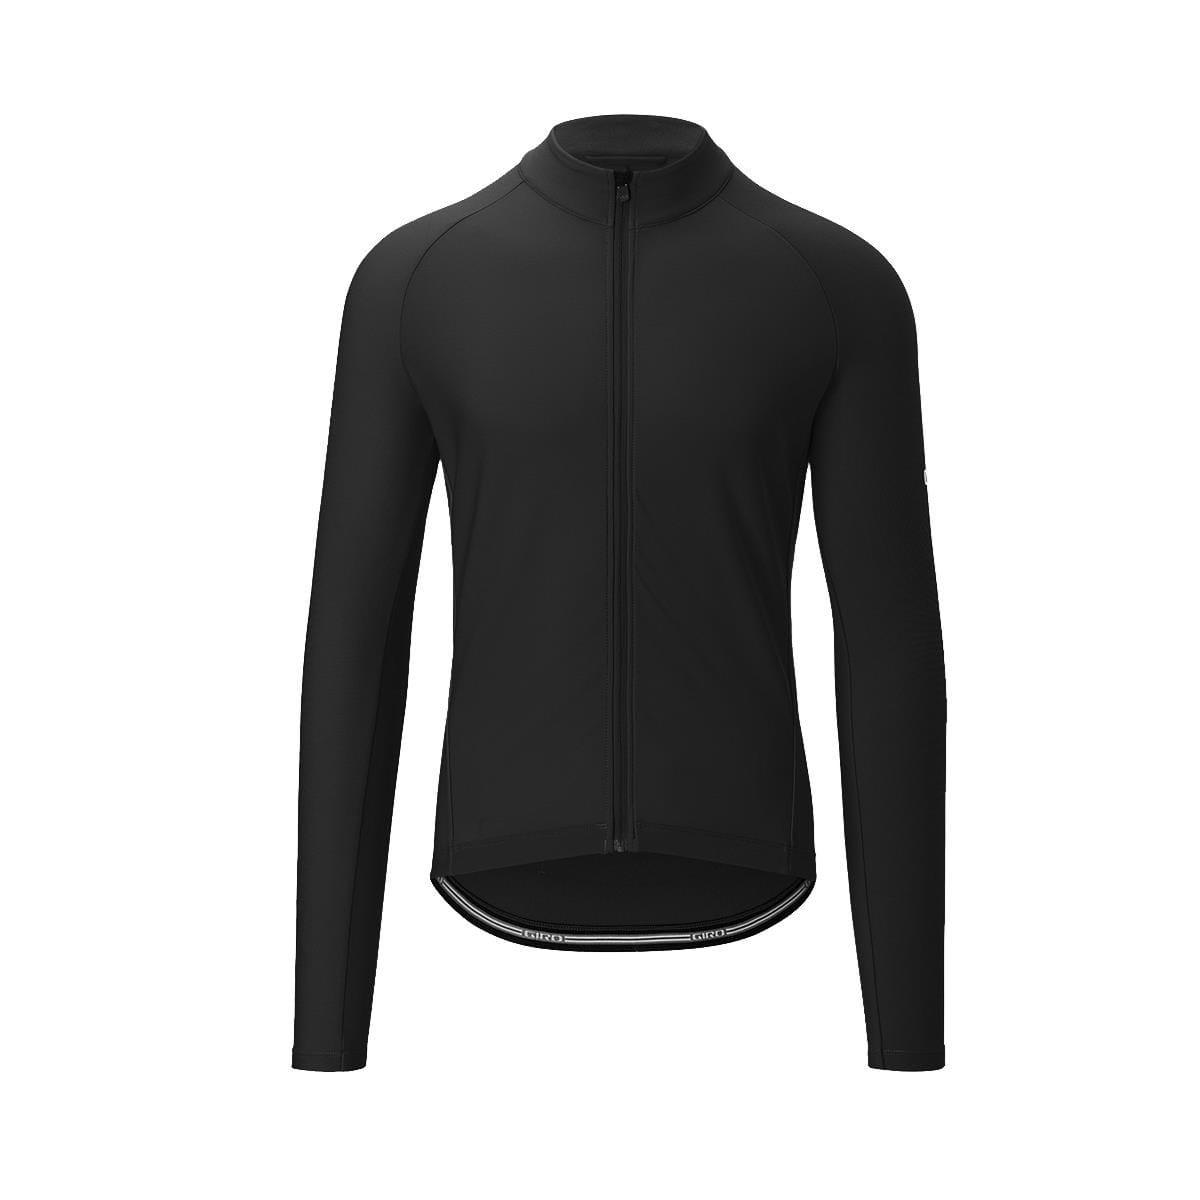 Men's Chrono Long Sleeve Thermal Jersey